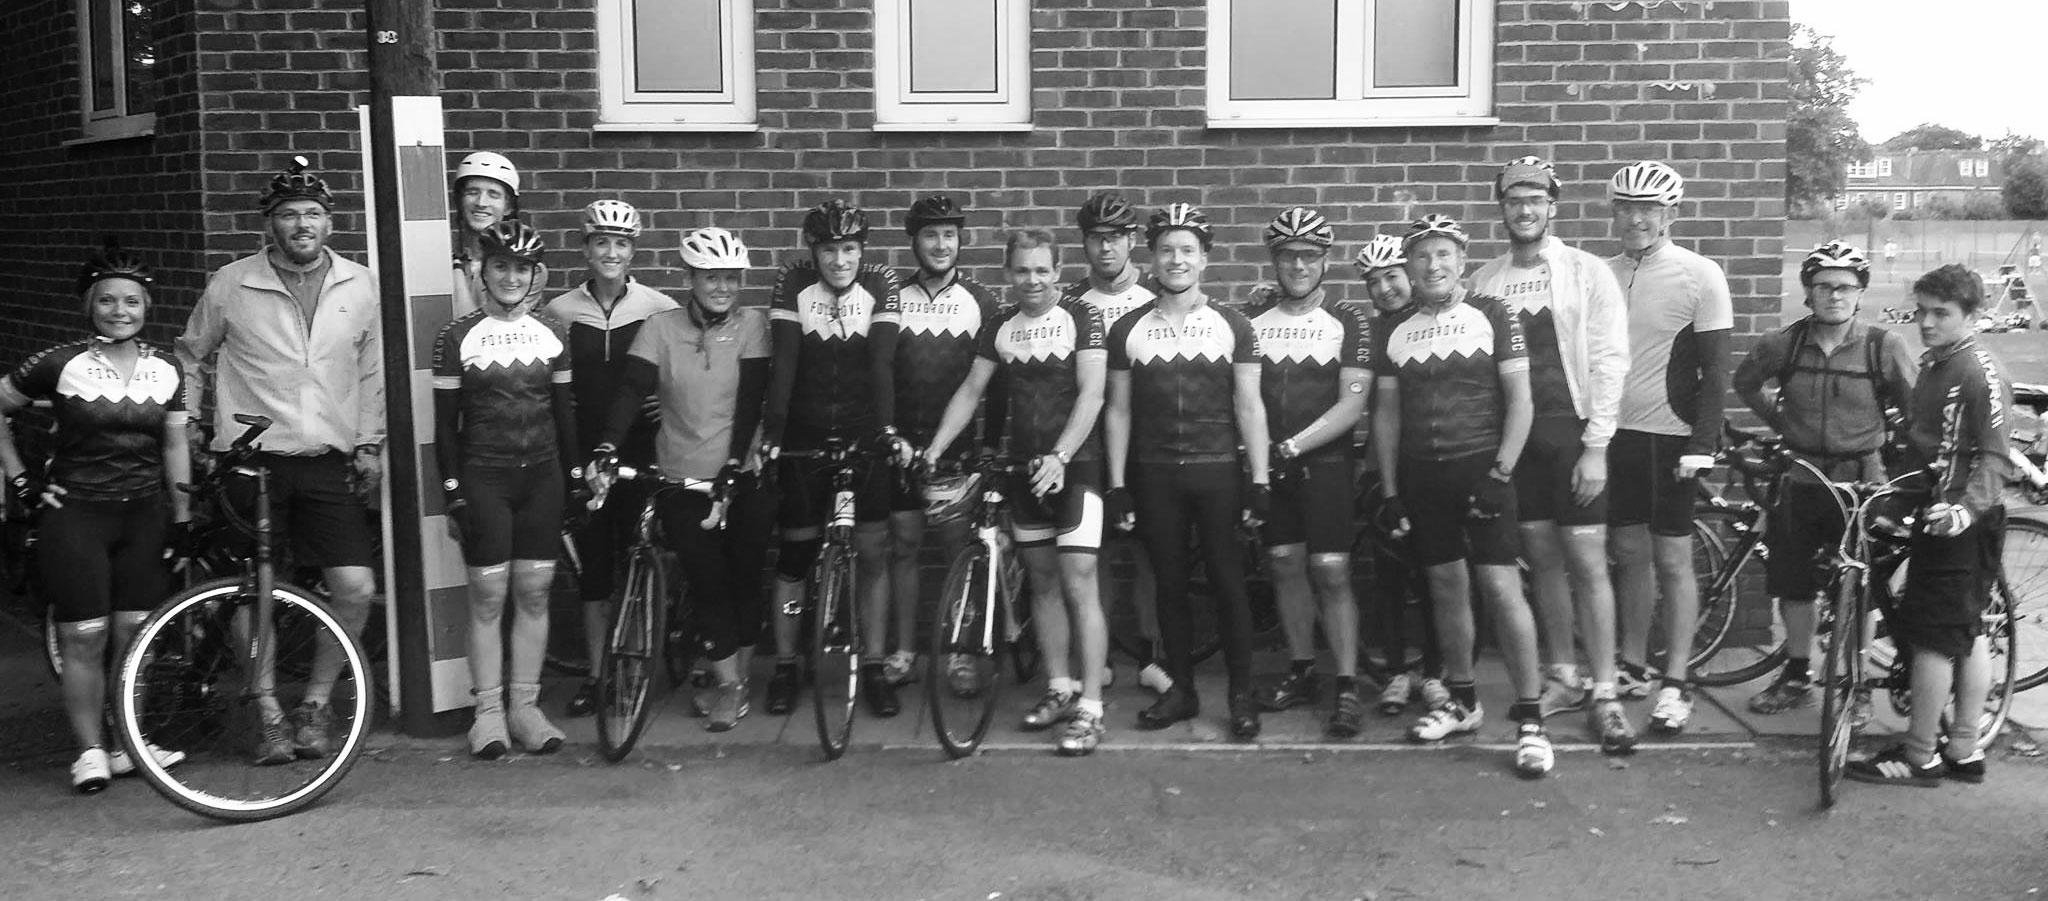 Foxgrove Cycling Club